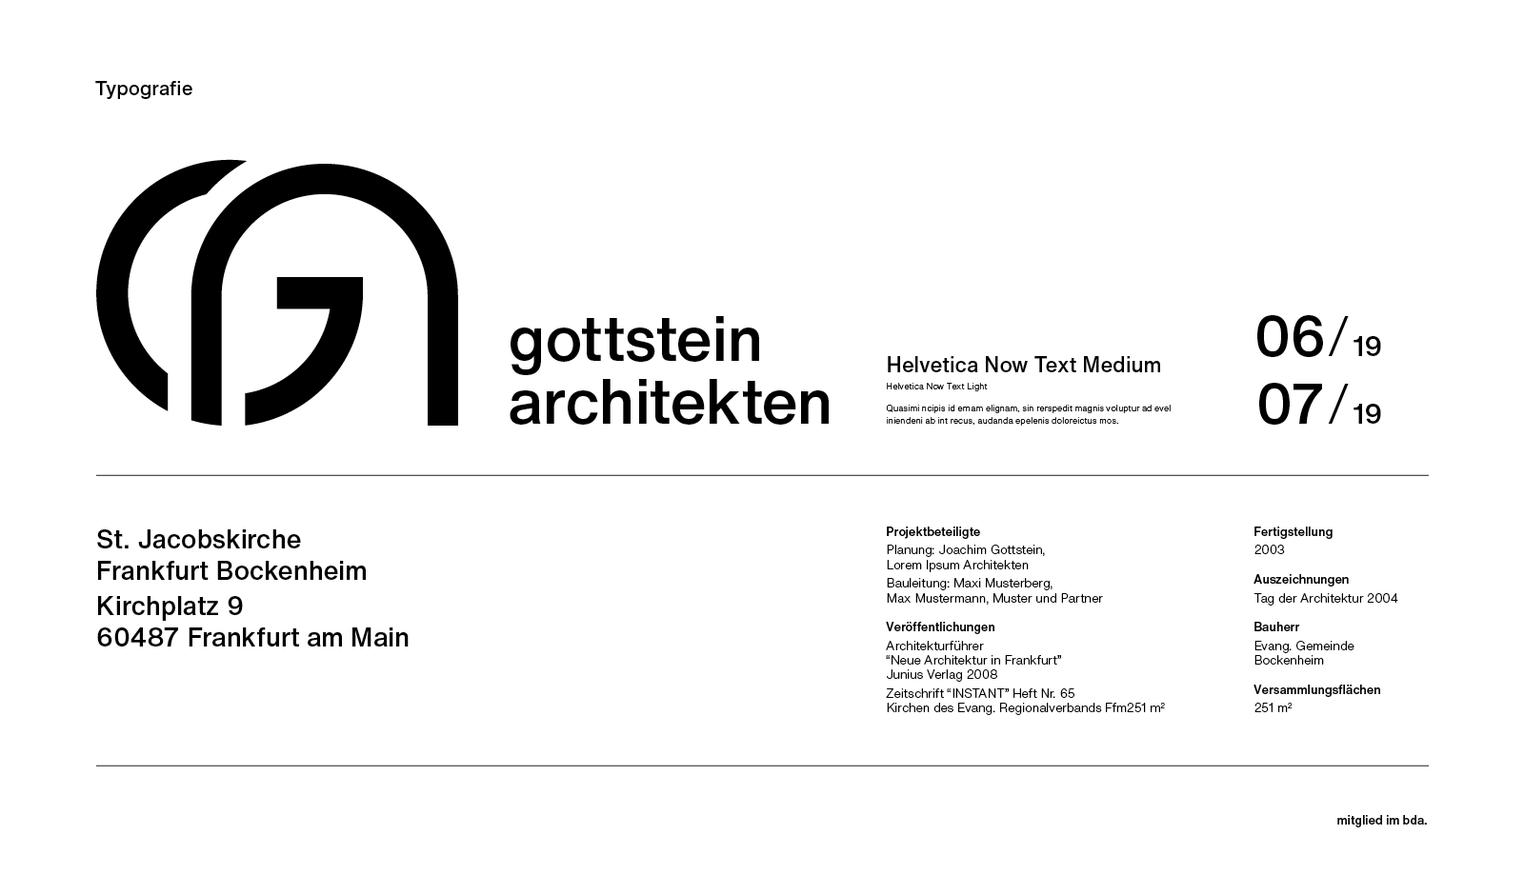 Corporate Design Typografie Moodboard Design Anwendung